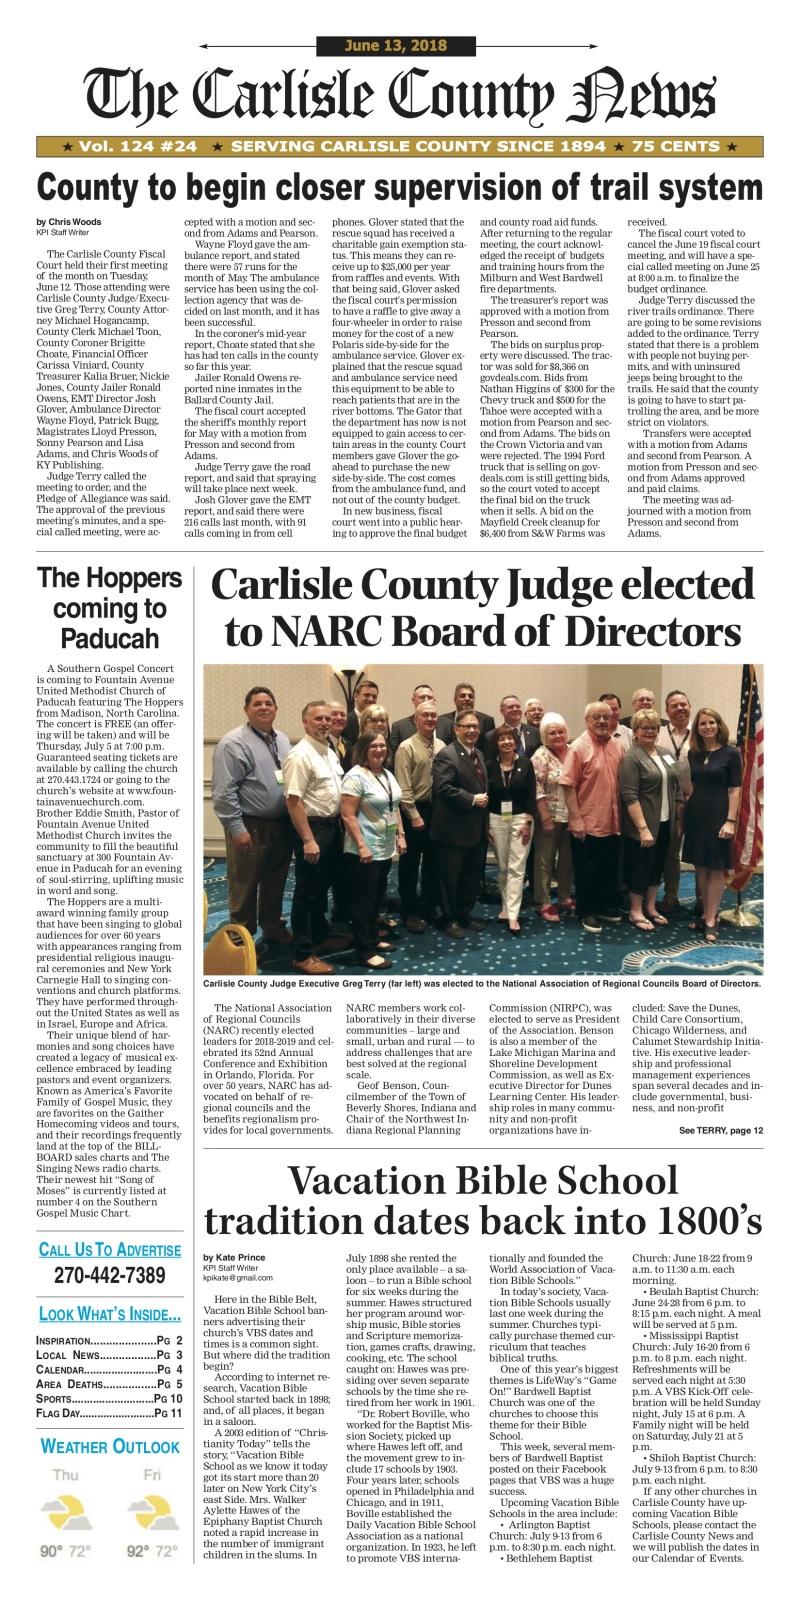 Carlisle County News  6-13-18